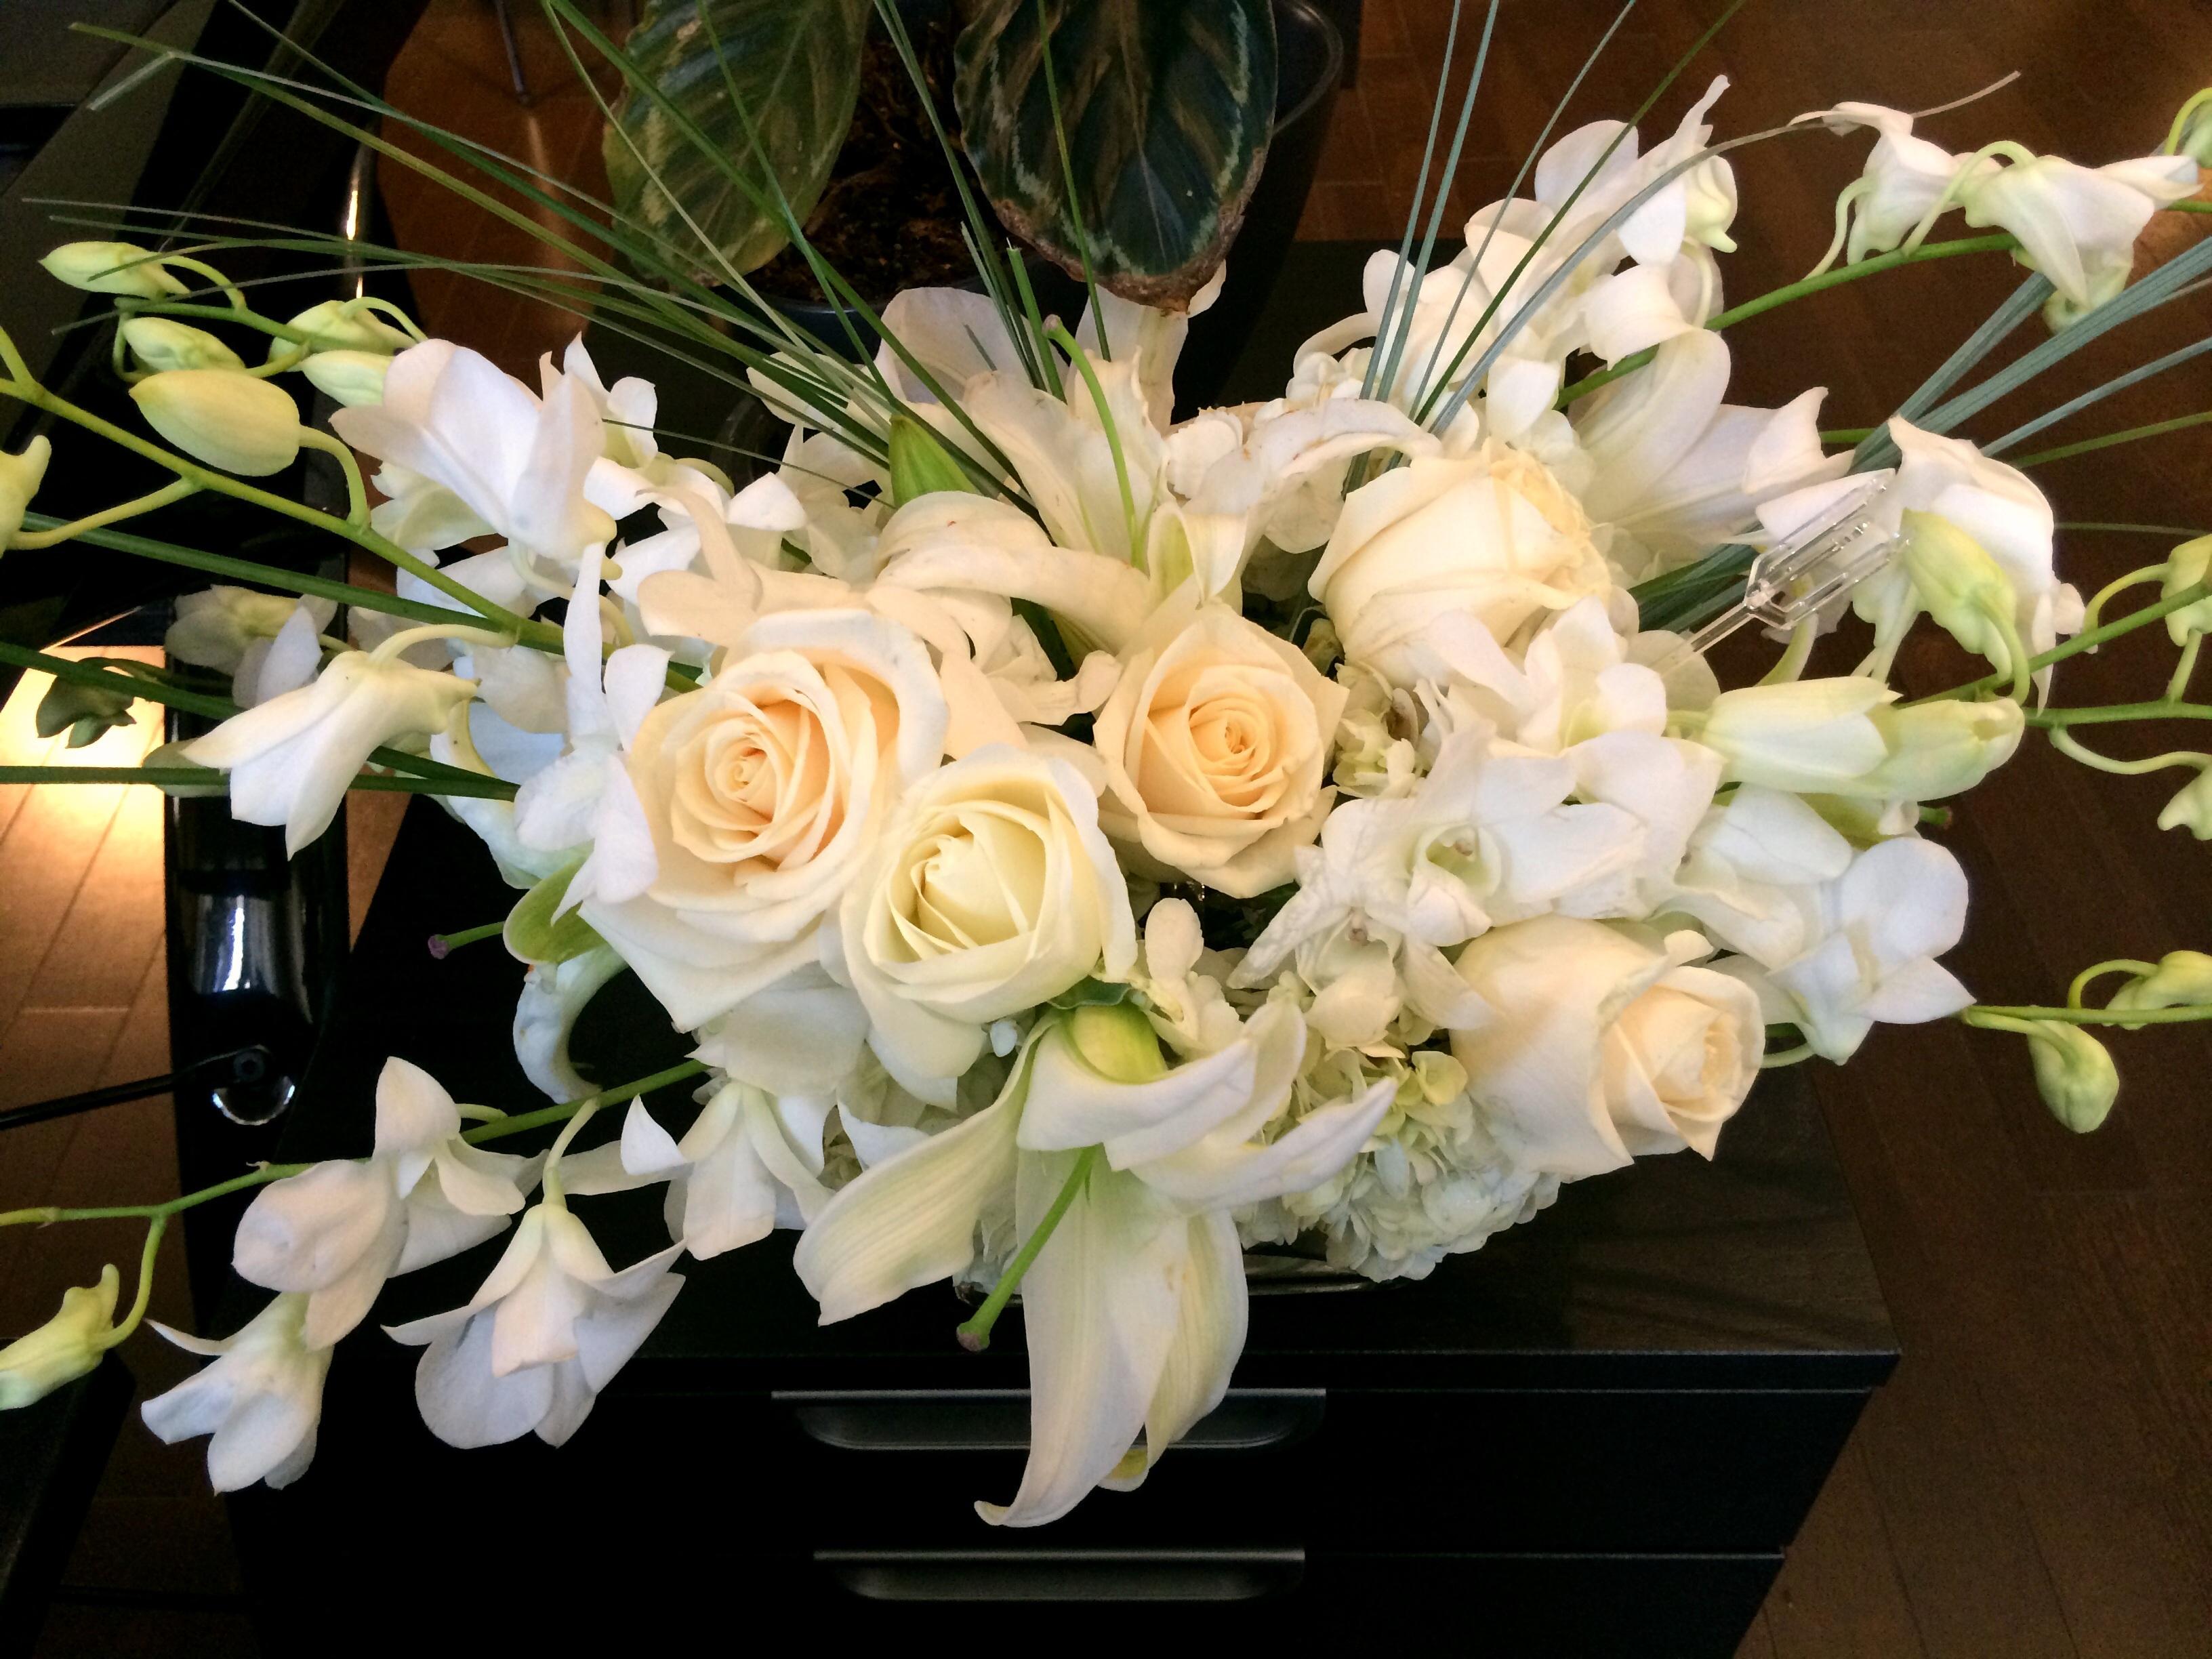 Free Images : flora, florist, art, floristry, retail, flowering ...